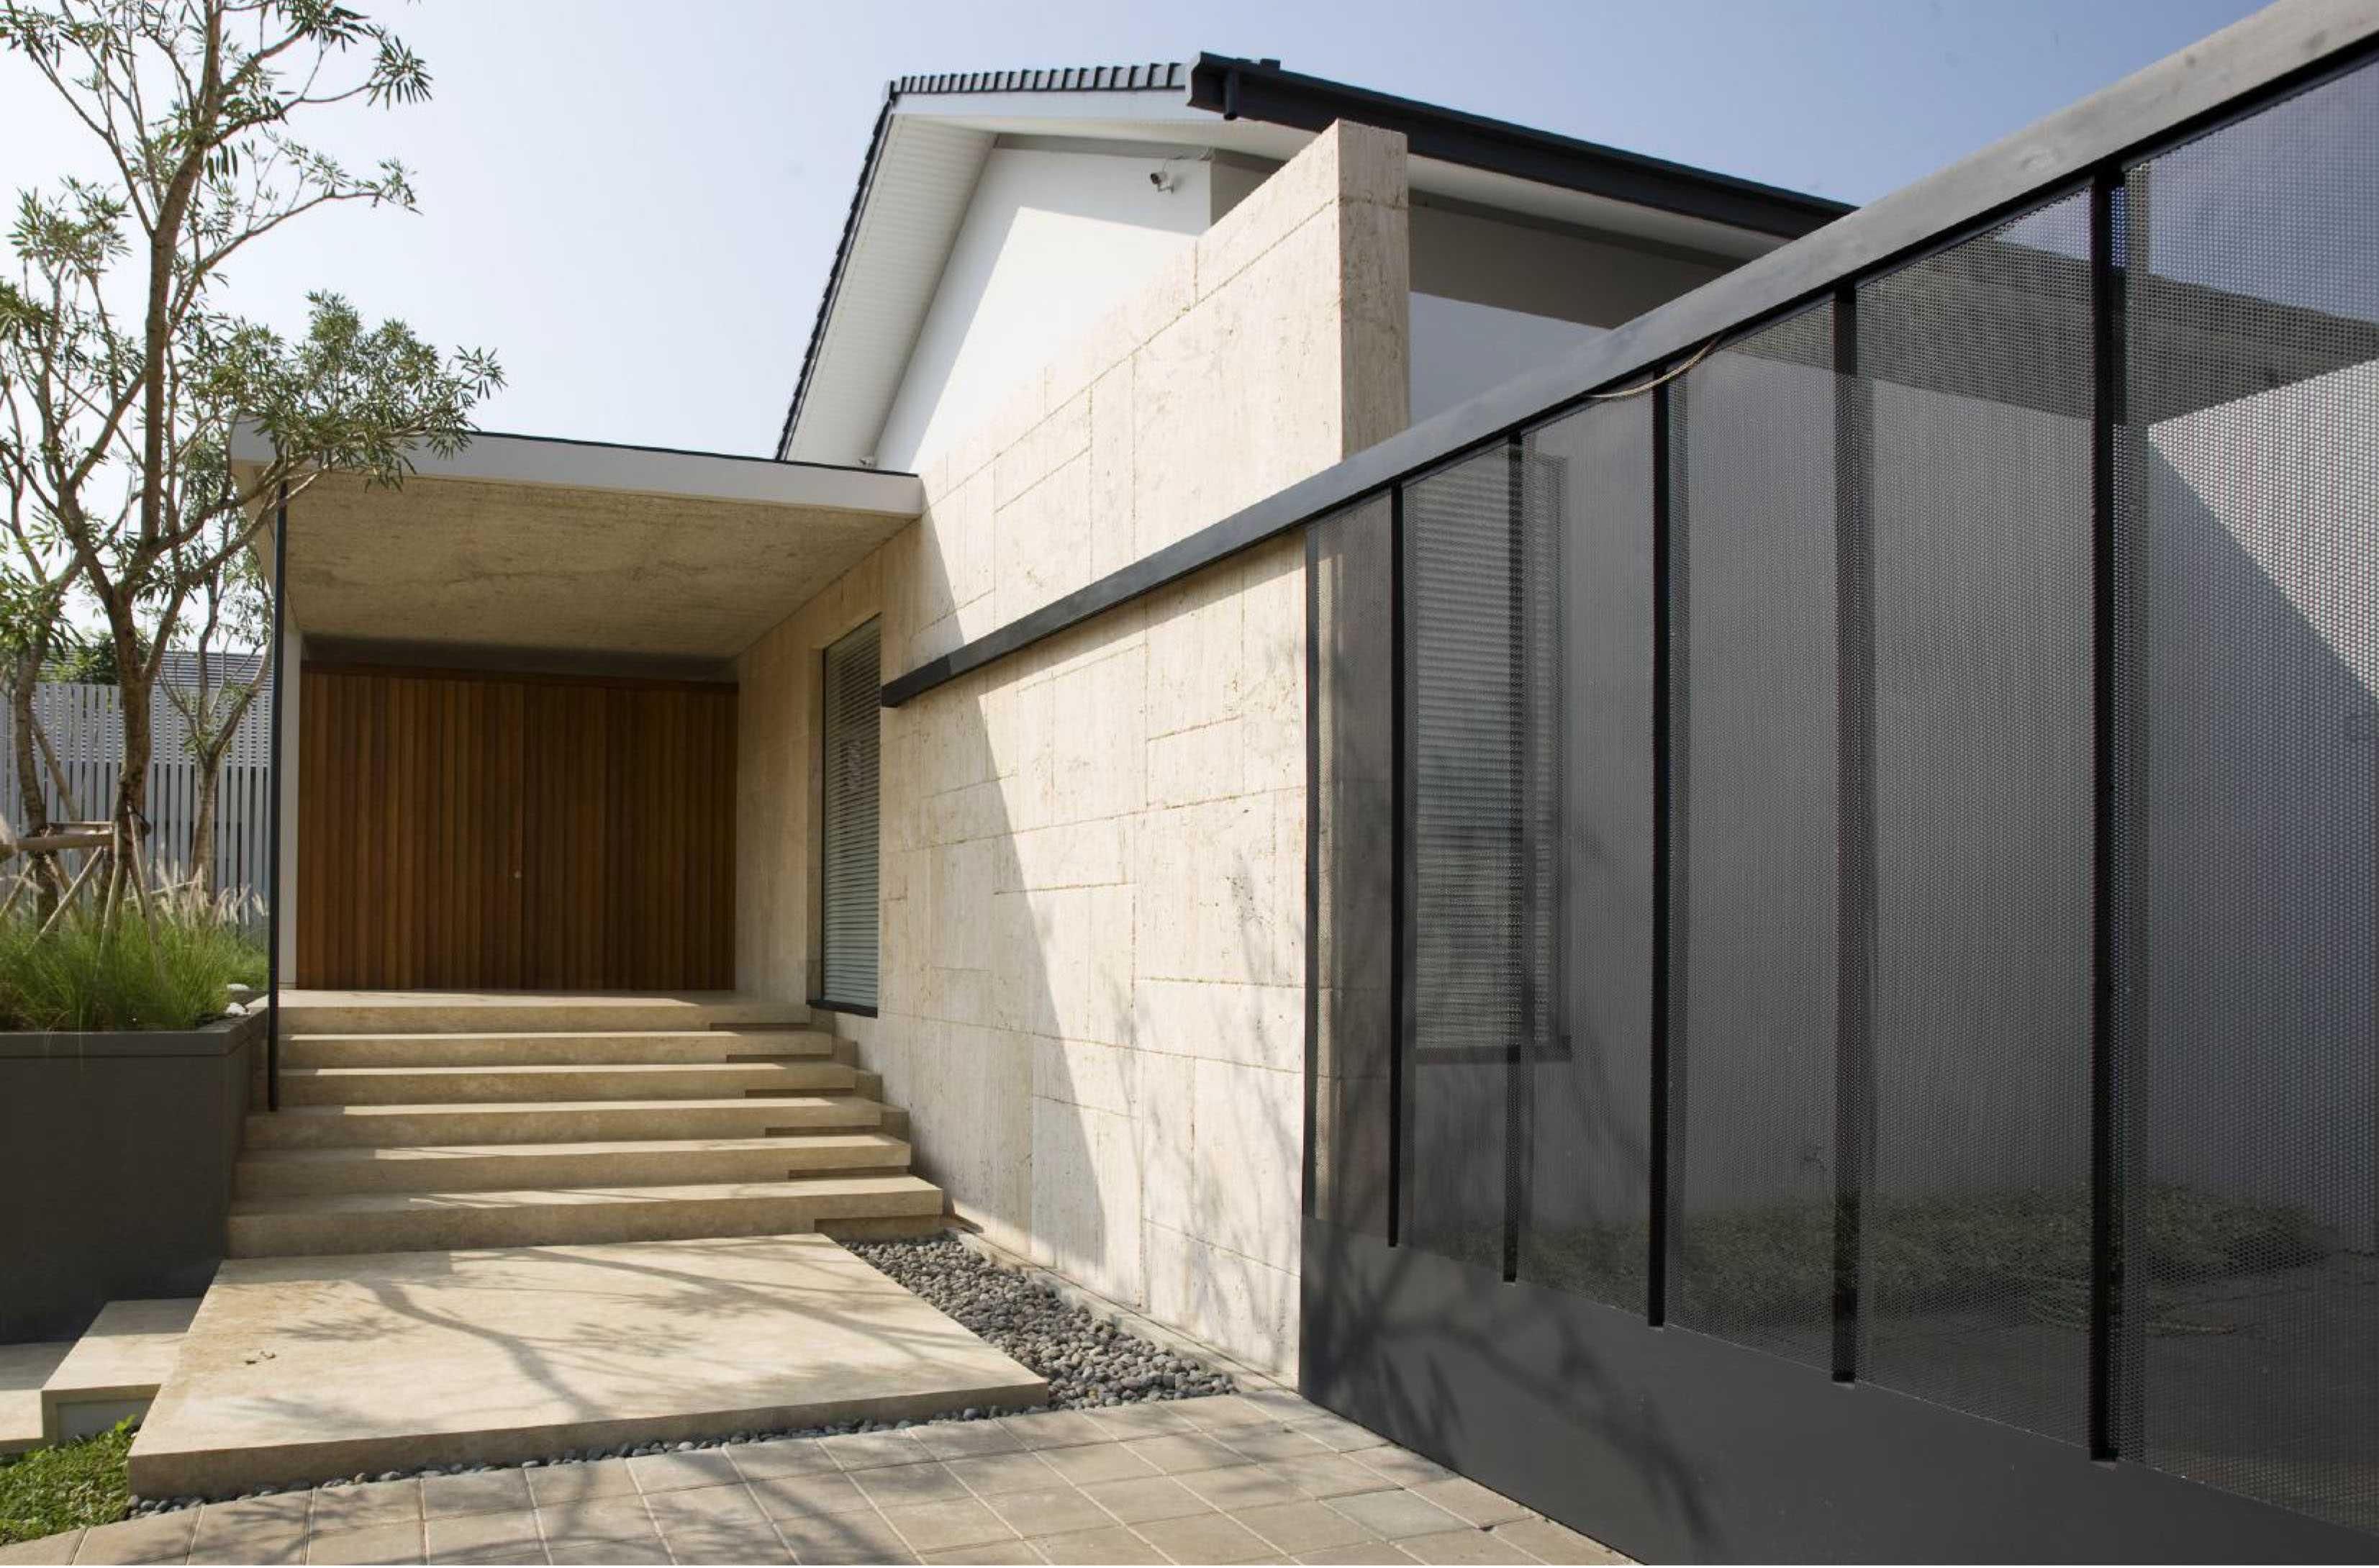 Studio Air Putih P_House Bsd, Serpong Bsd, Serpong Exterior   25072